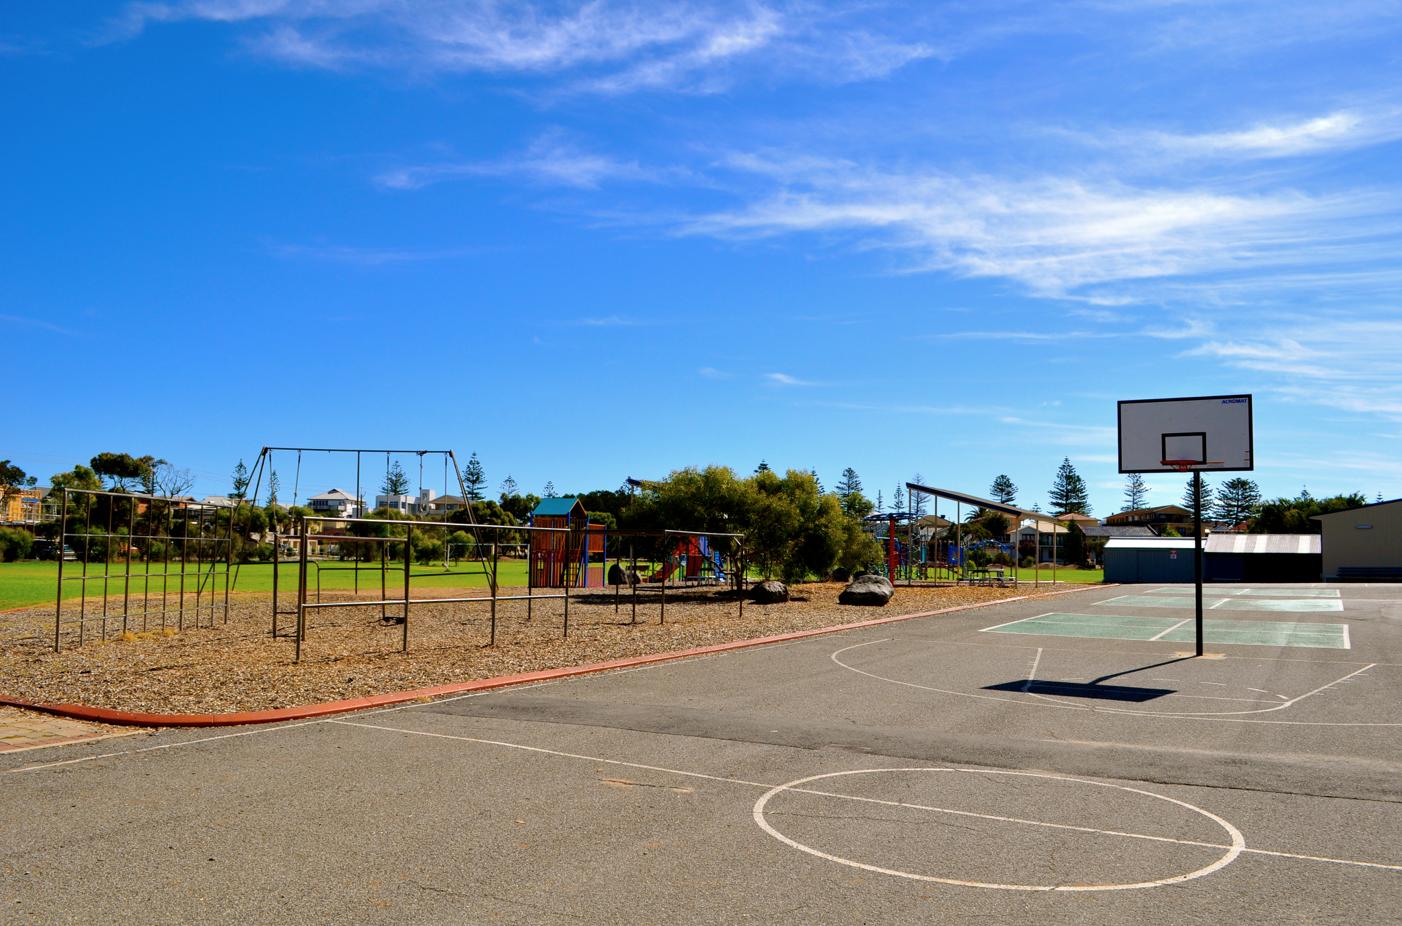 Playground / Basketball Court